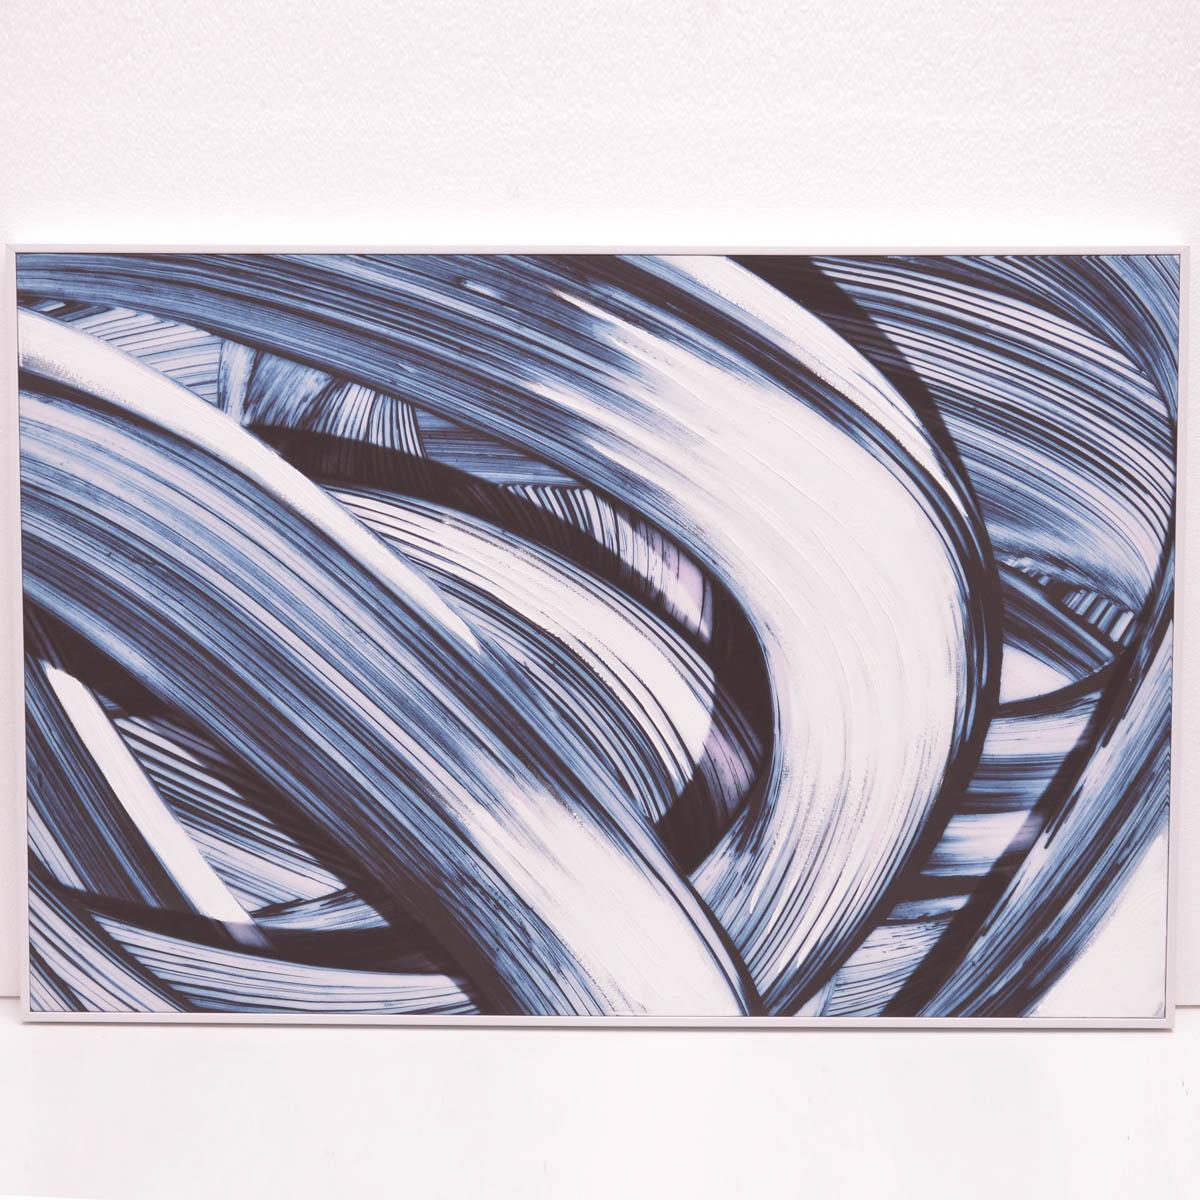 Cuadro Olas azul blanco negro 82X122 cm